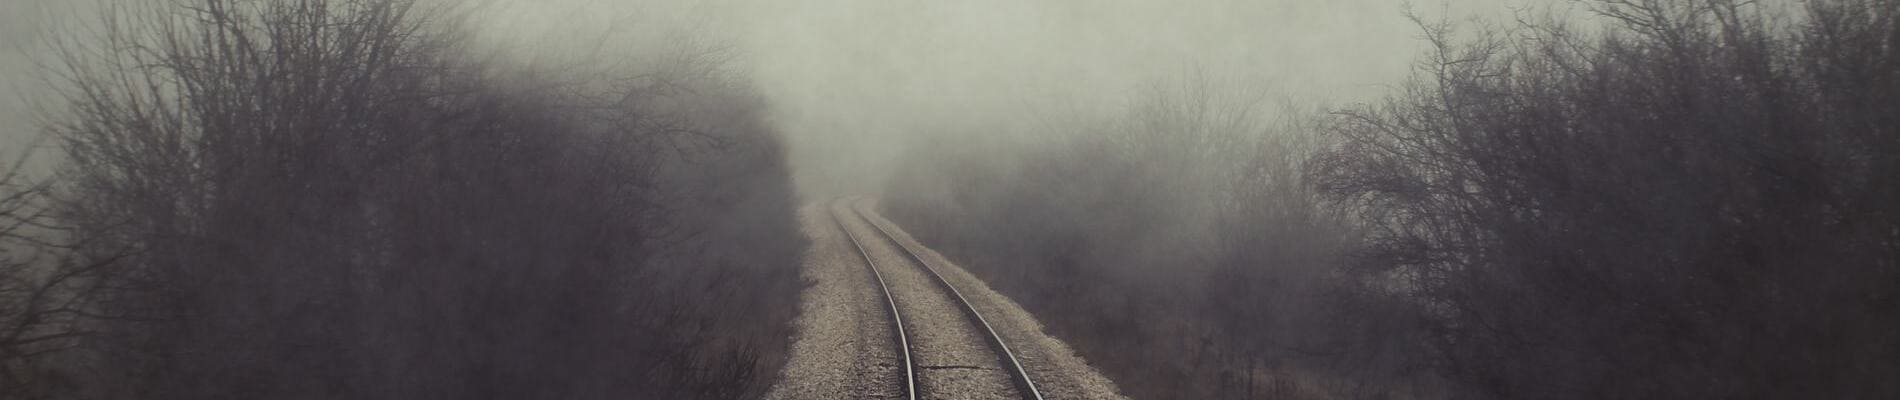 Road to Oblivion Milena Kancheva